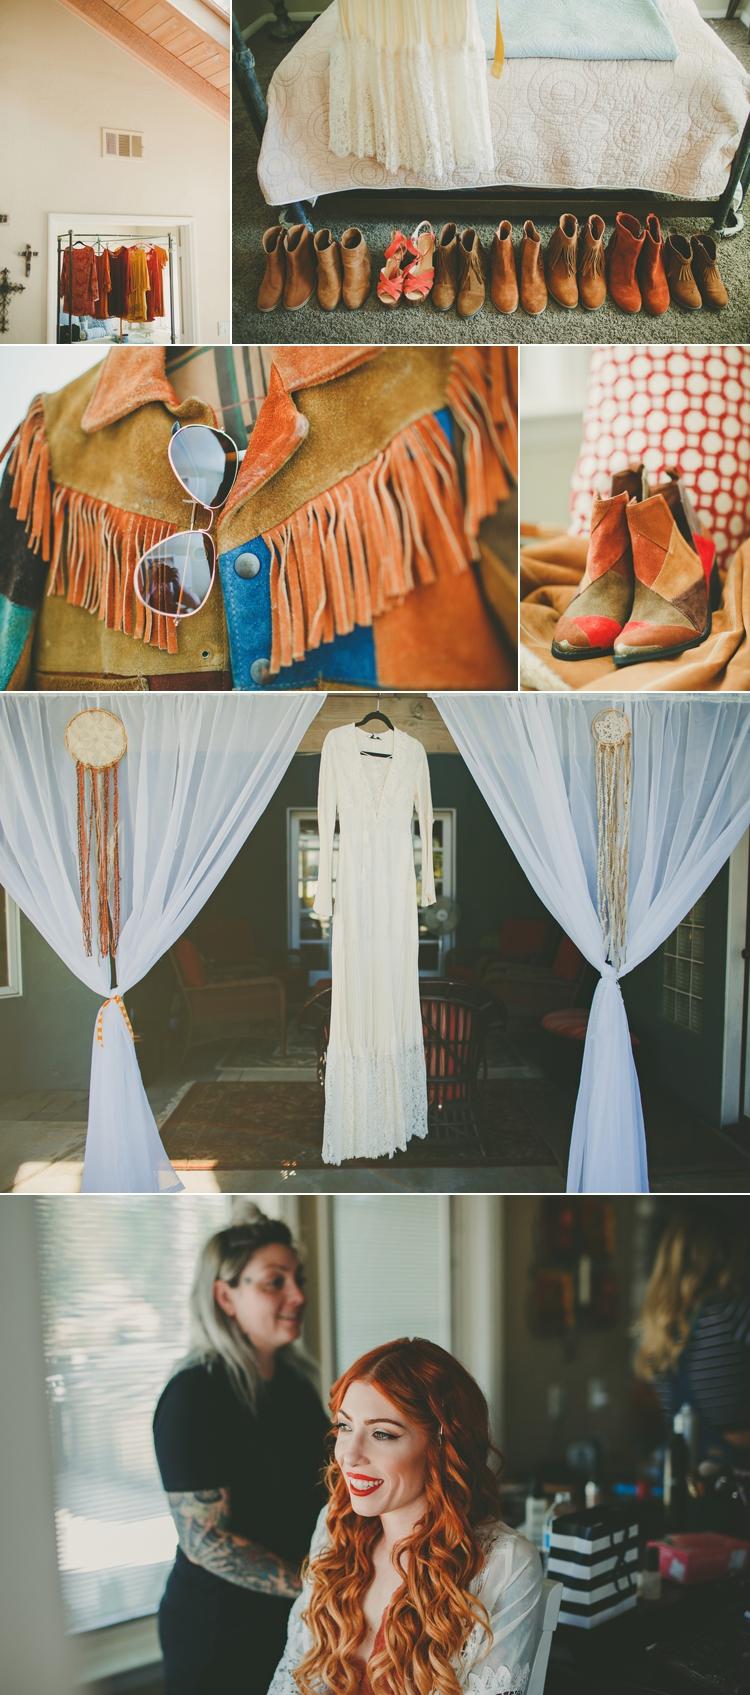 woodstock-inspired-wedding-photos-2